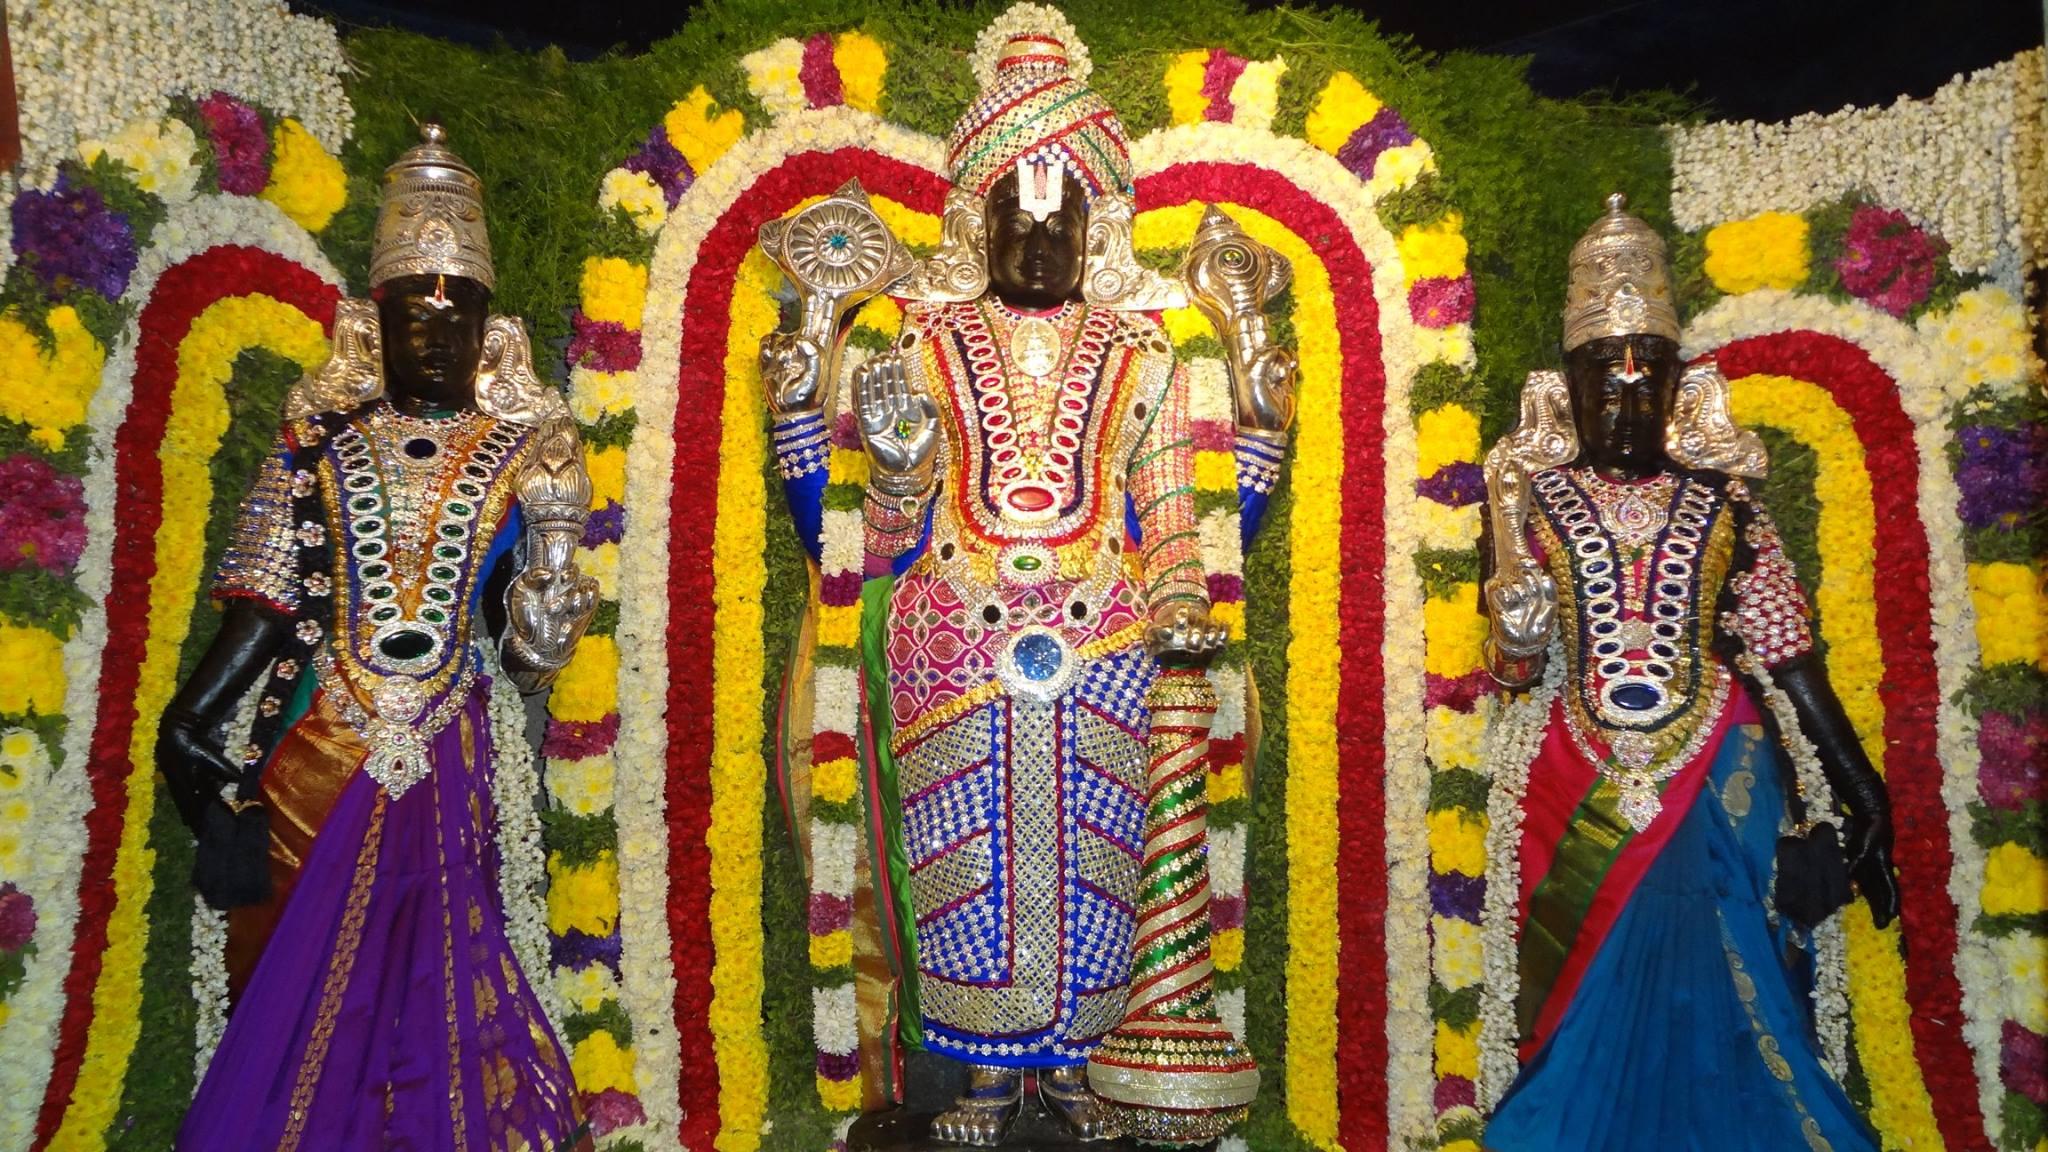 Vaikuntha Ekadashi in Vellore